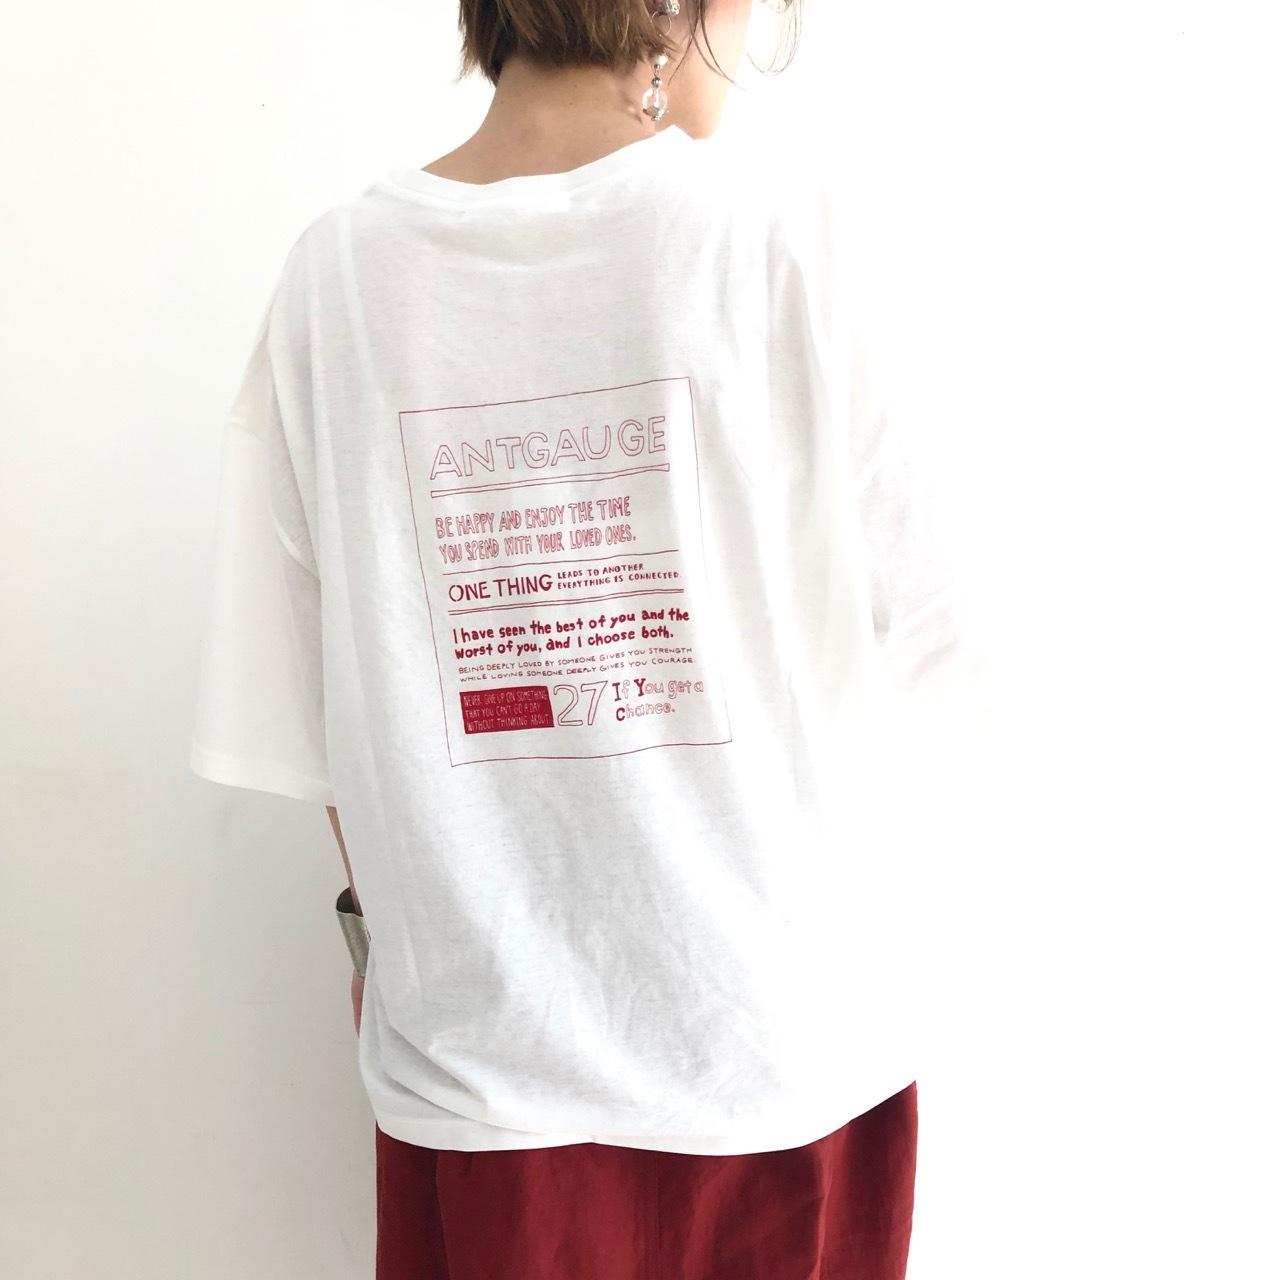 【 ANTGAUGE 】- AB838 - プリントTeeシャツ